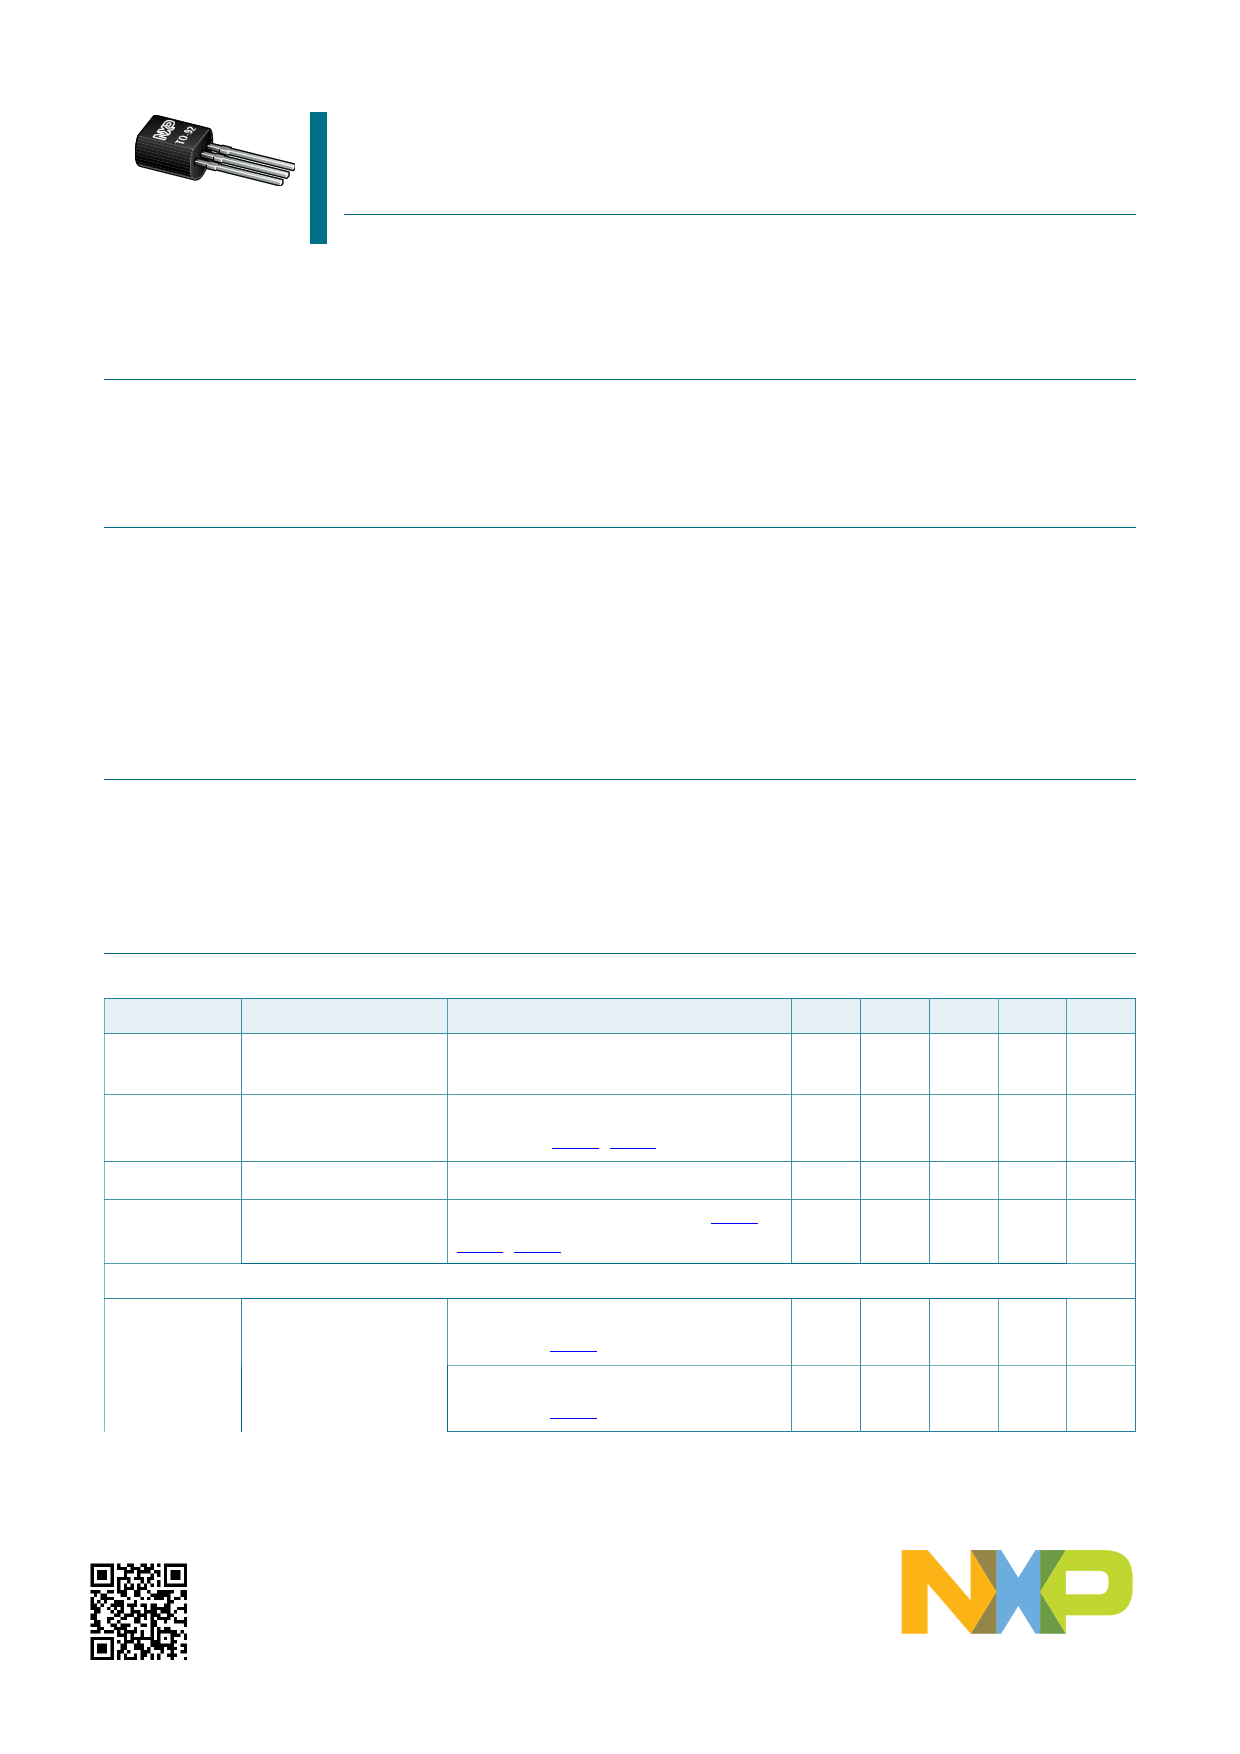 BT131-600 دیتاشیت PDF